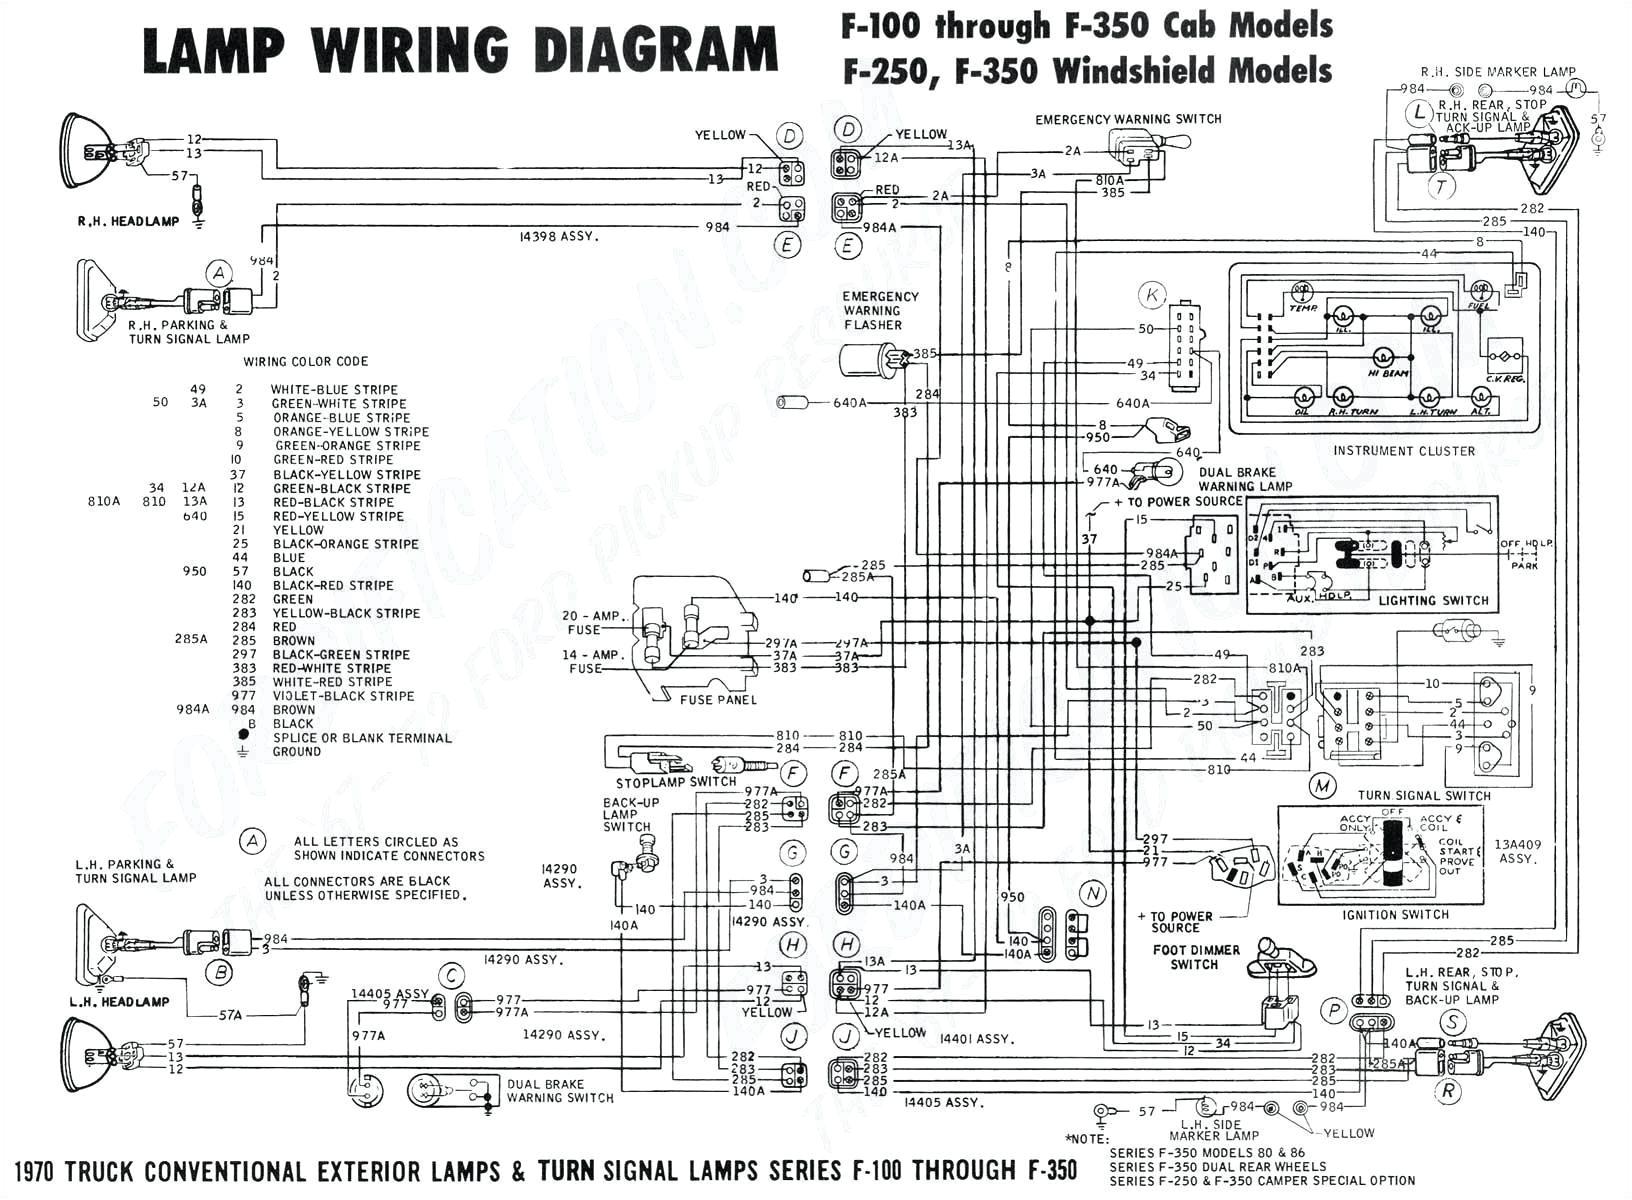 diamante engine diagram trusted wiring diagrams u2022 rh inspiralni co 97 eclipse wiring diagram 97